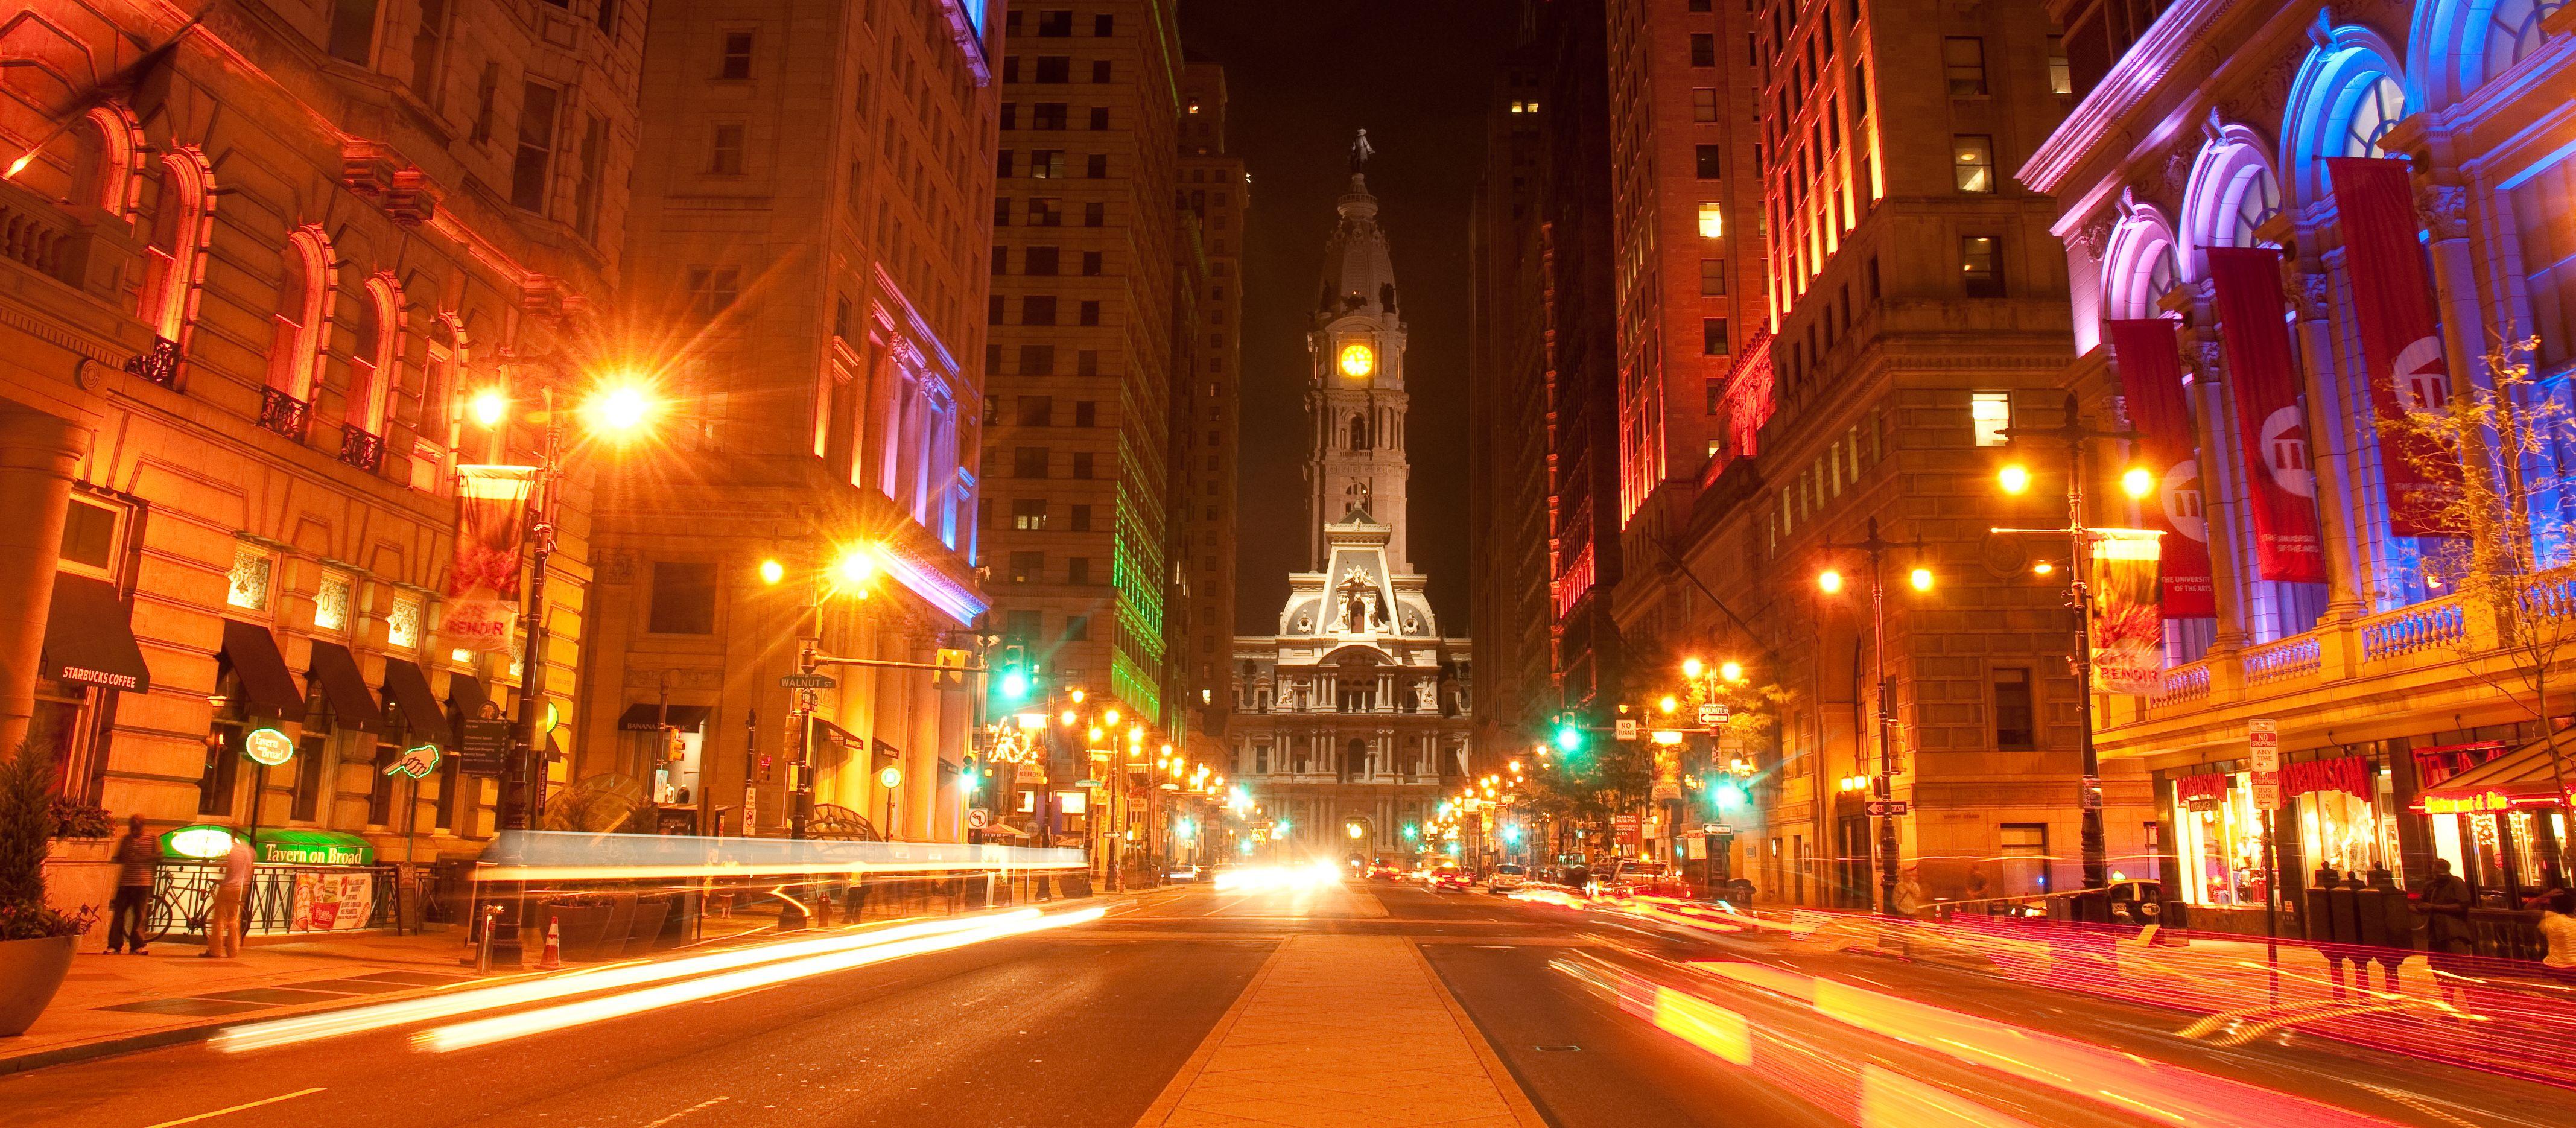 Philadelphia City Hall - Das Rathaus Philadelphias bei Nacht